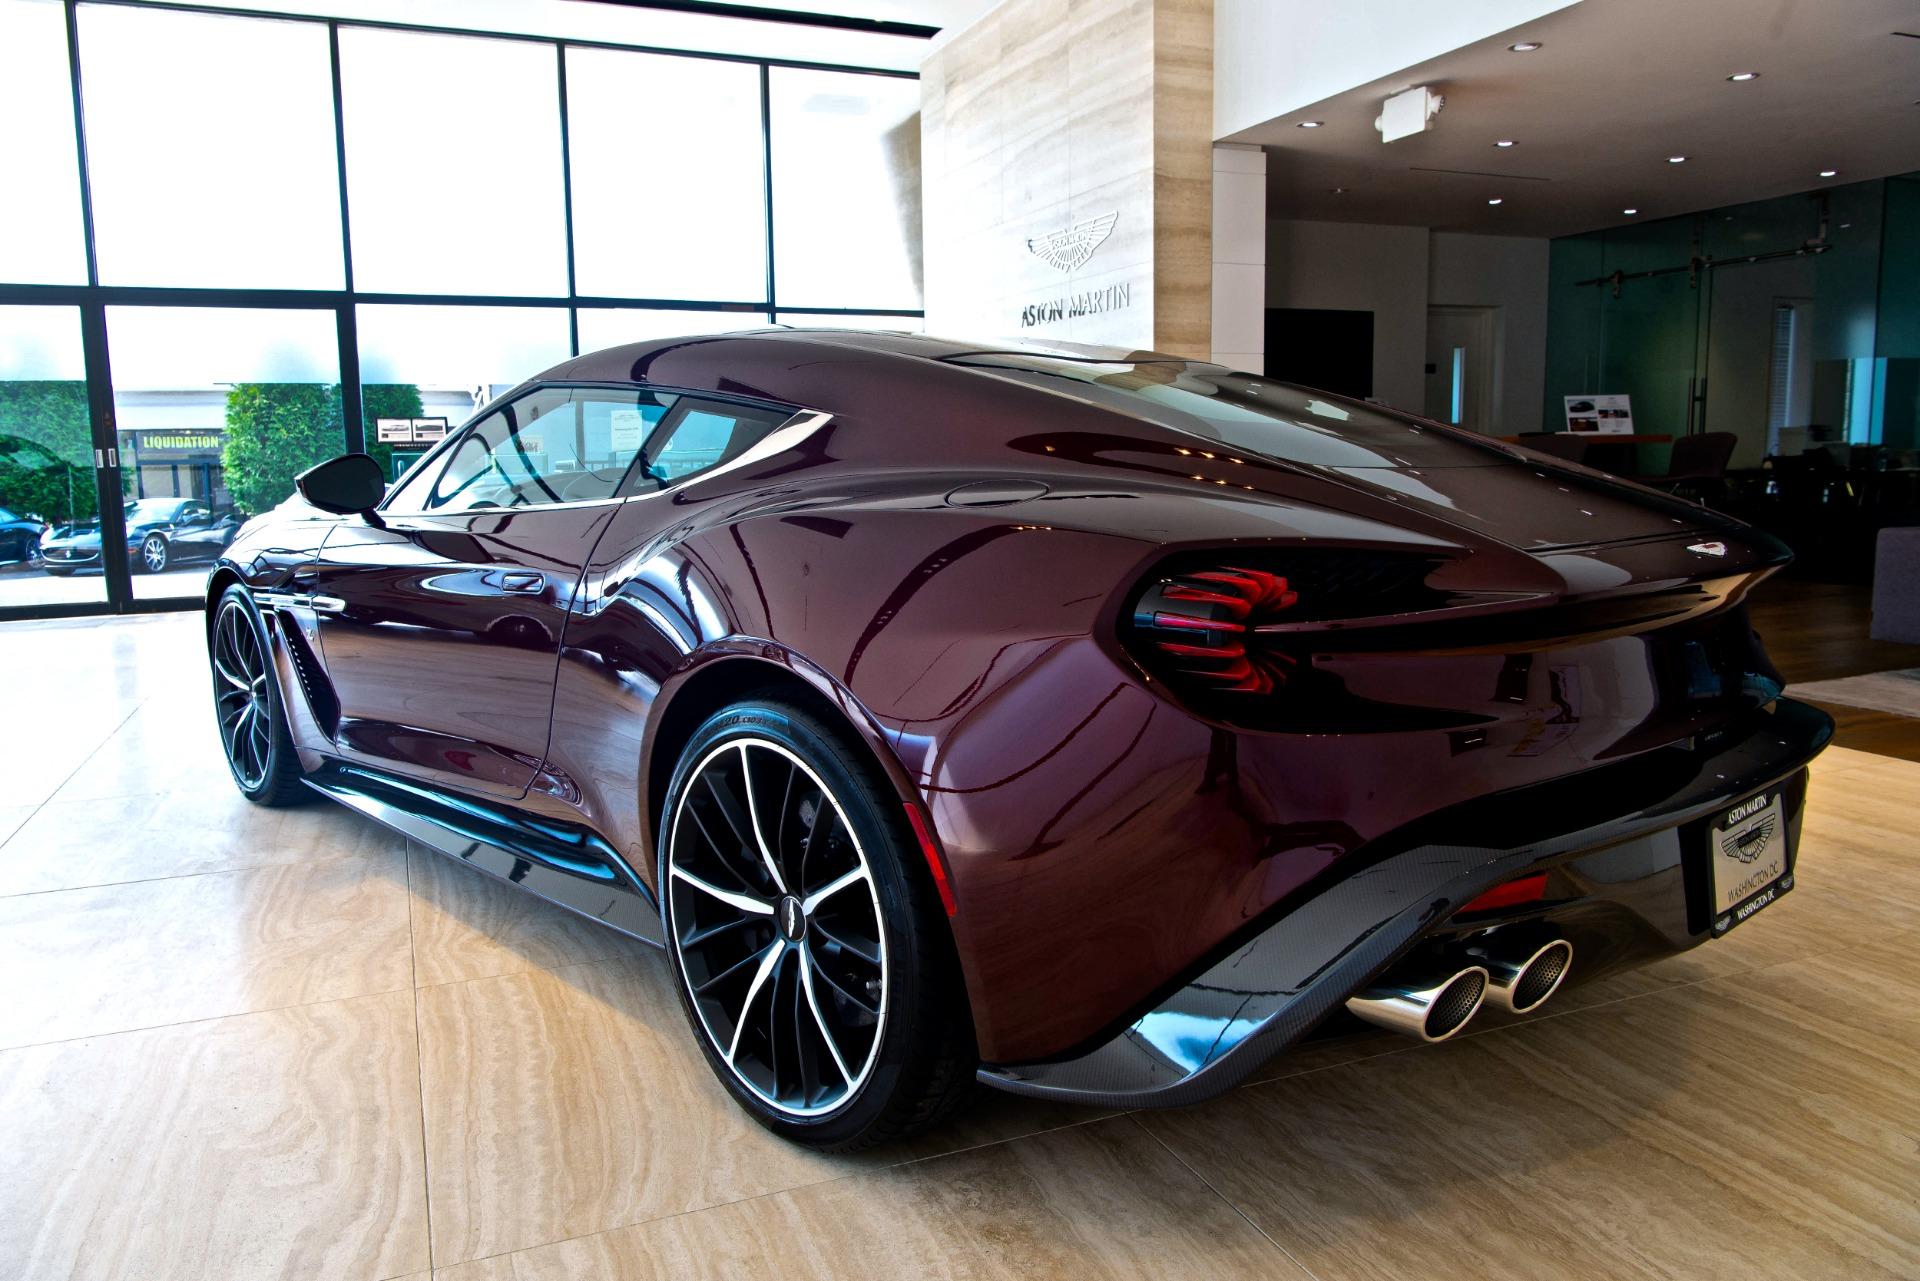 2018 Aston Martin Vanquish Zagato Coupe 72 99 Stock Pj33939 For Sale Near Vienna Va Va Aston Martin Dealer